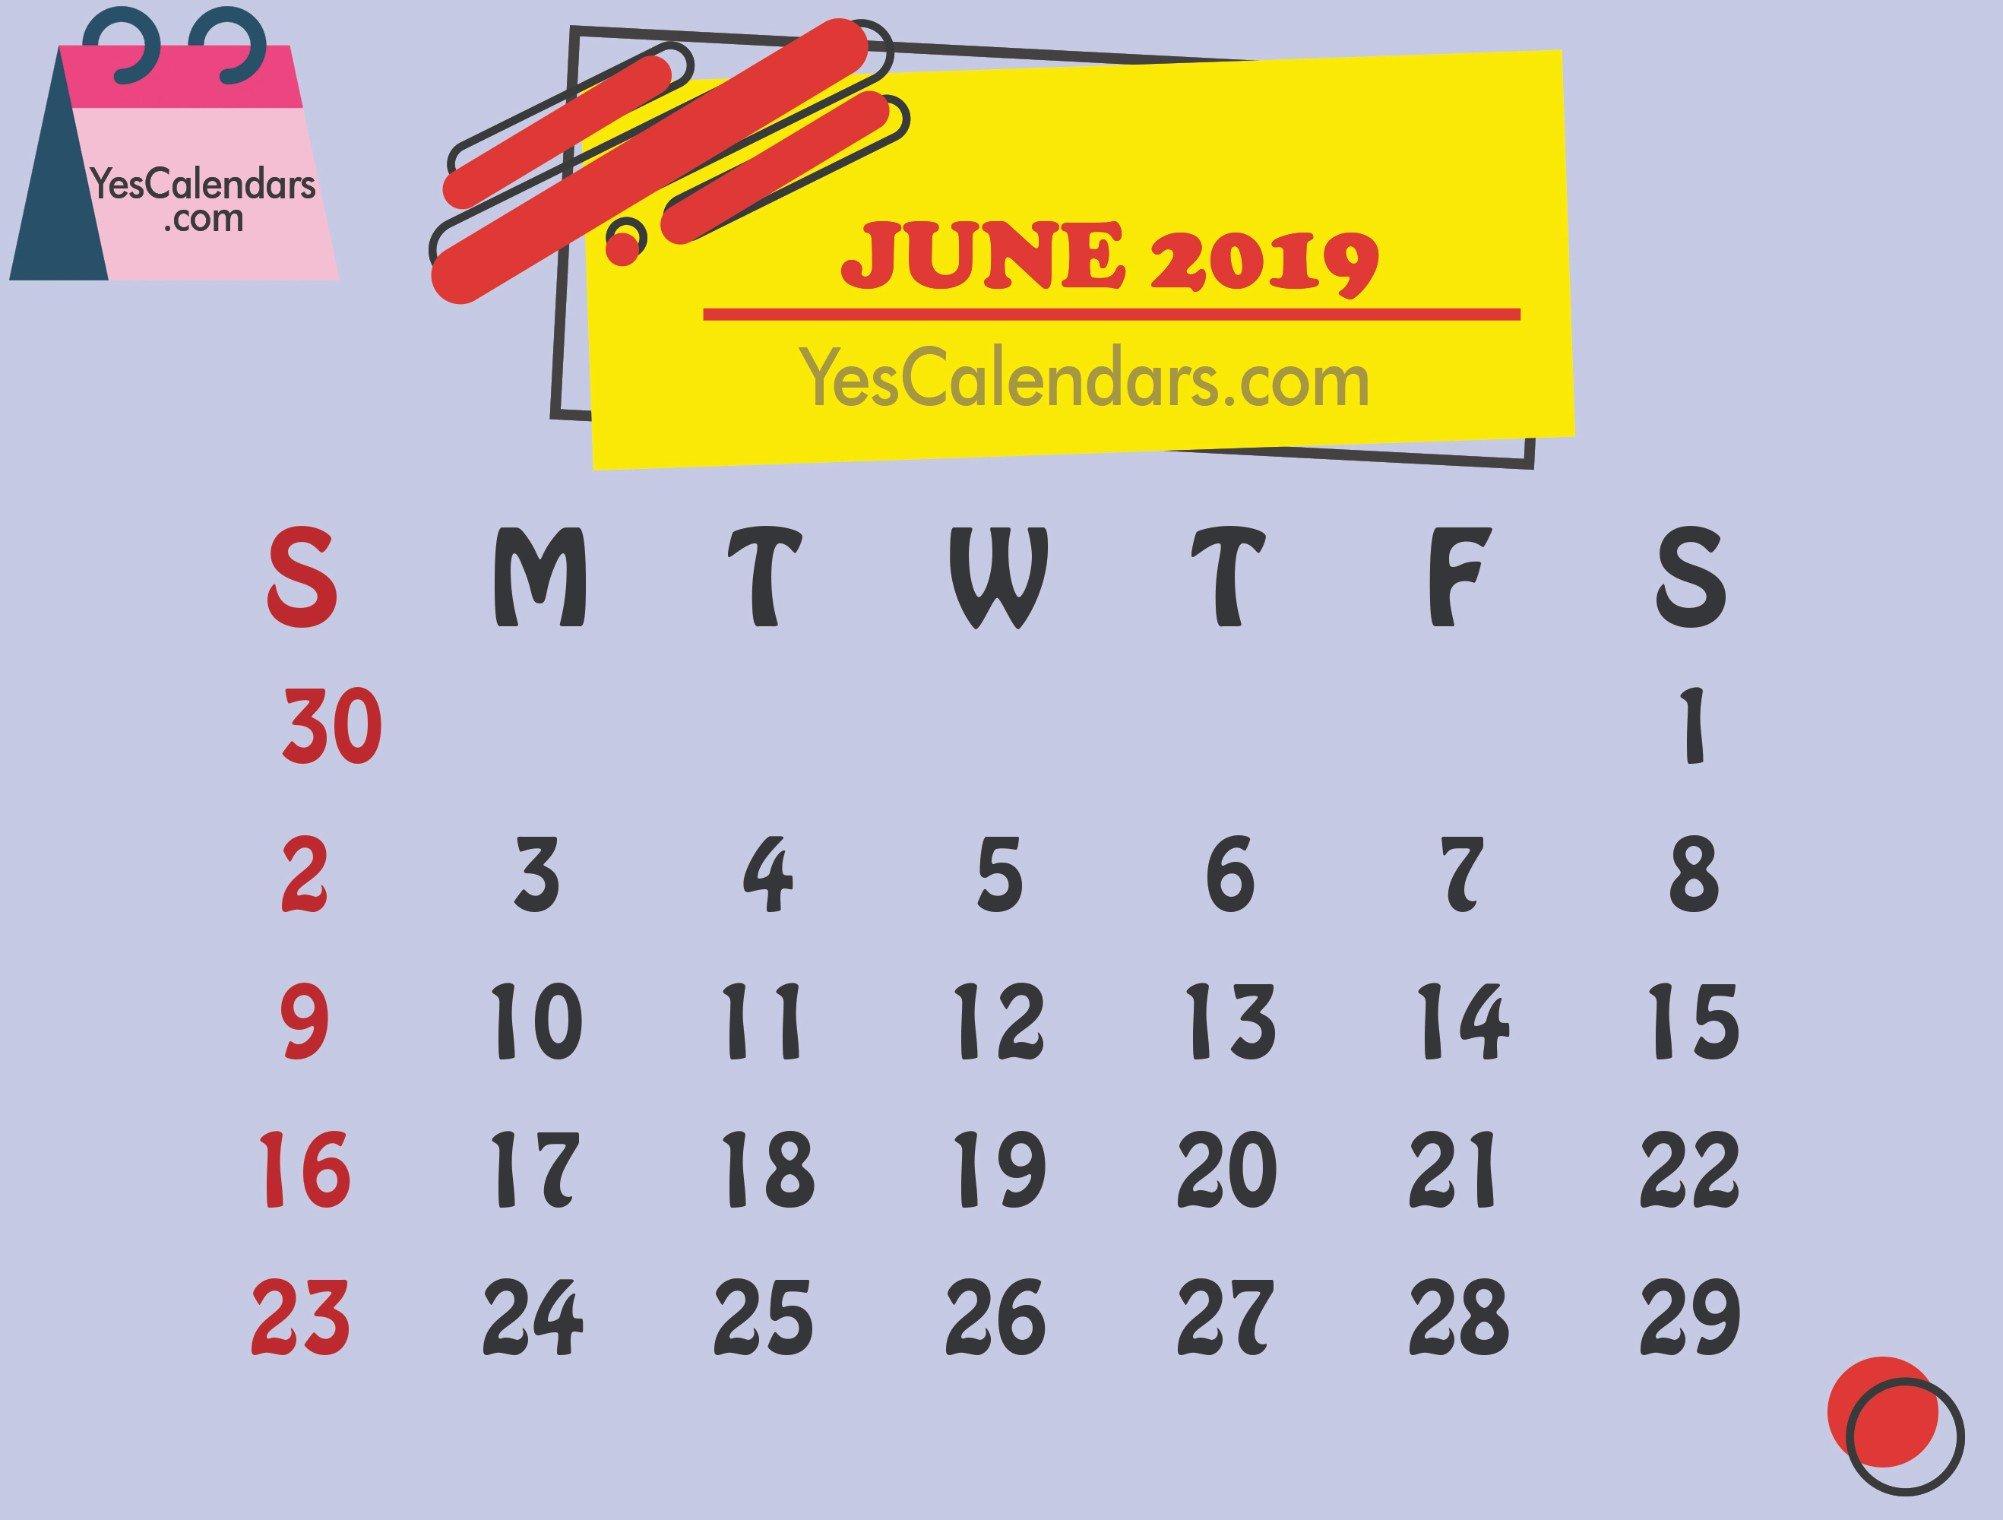 Printable June 2019 Calendar Template Holidays - Yes Calendars June 2 2019 Calendar